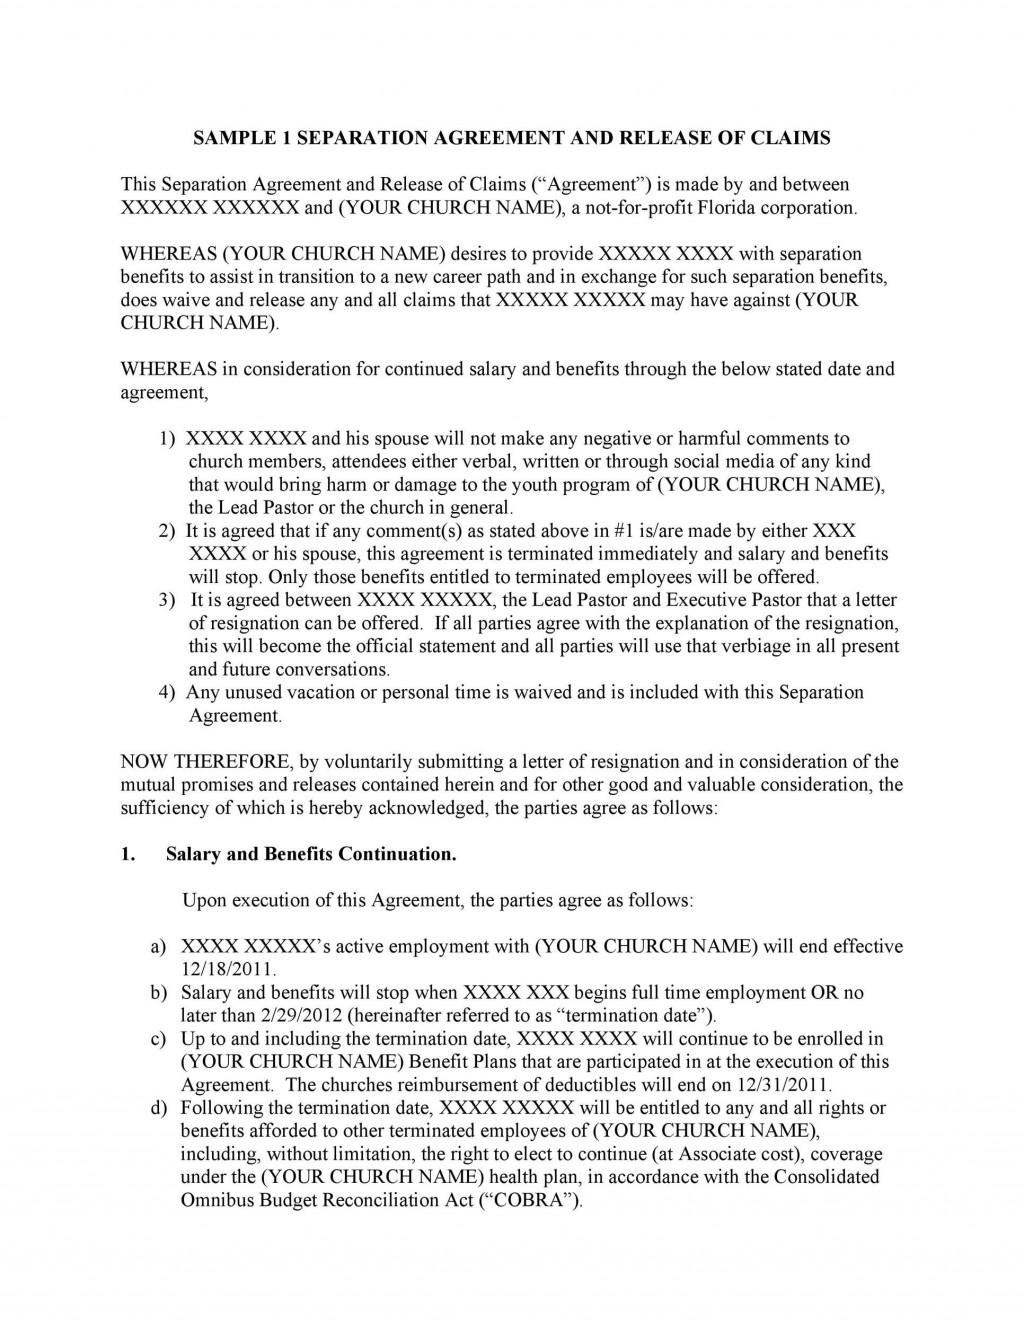 007 Unbelievable Busines Partnership Separation Agreement Template Inspiration  Partner TerminationLarge